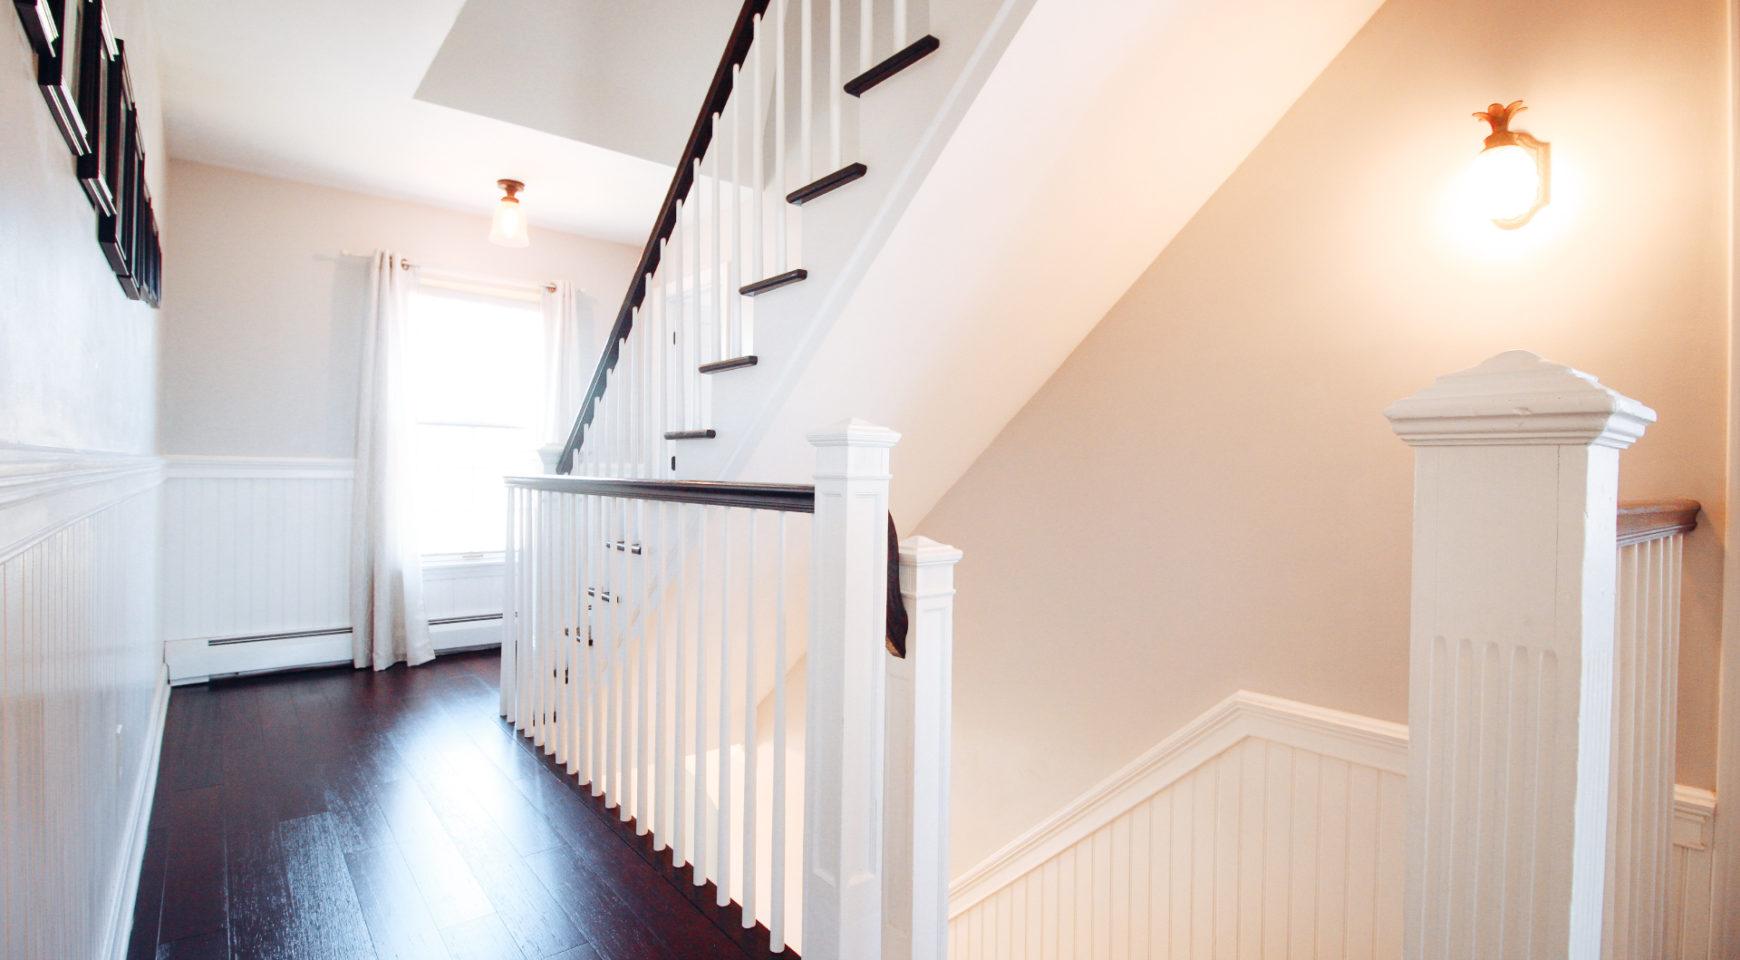 Luxe_and_Livable_Interior_Design_Blog_by_Maloney_Interiors_Newport_Rhode_Island_Fitzpatrick_Team_Remax_12.jpg